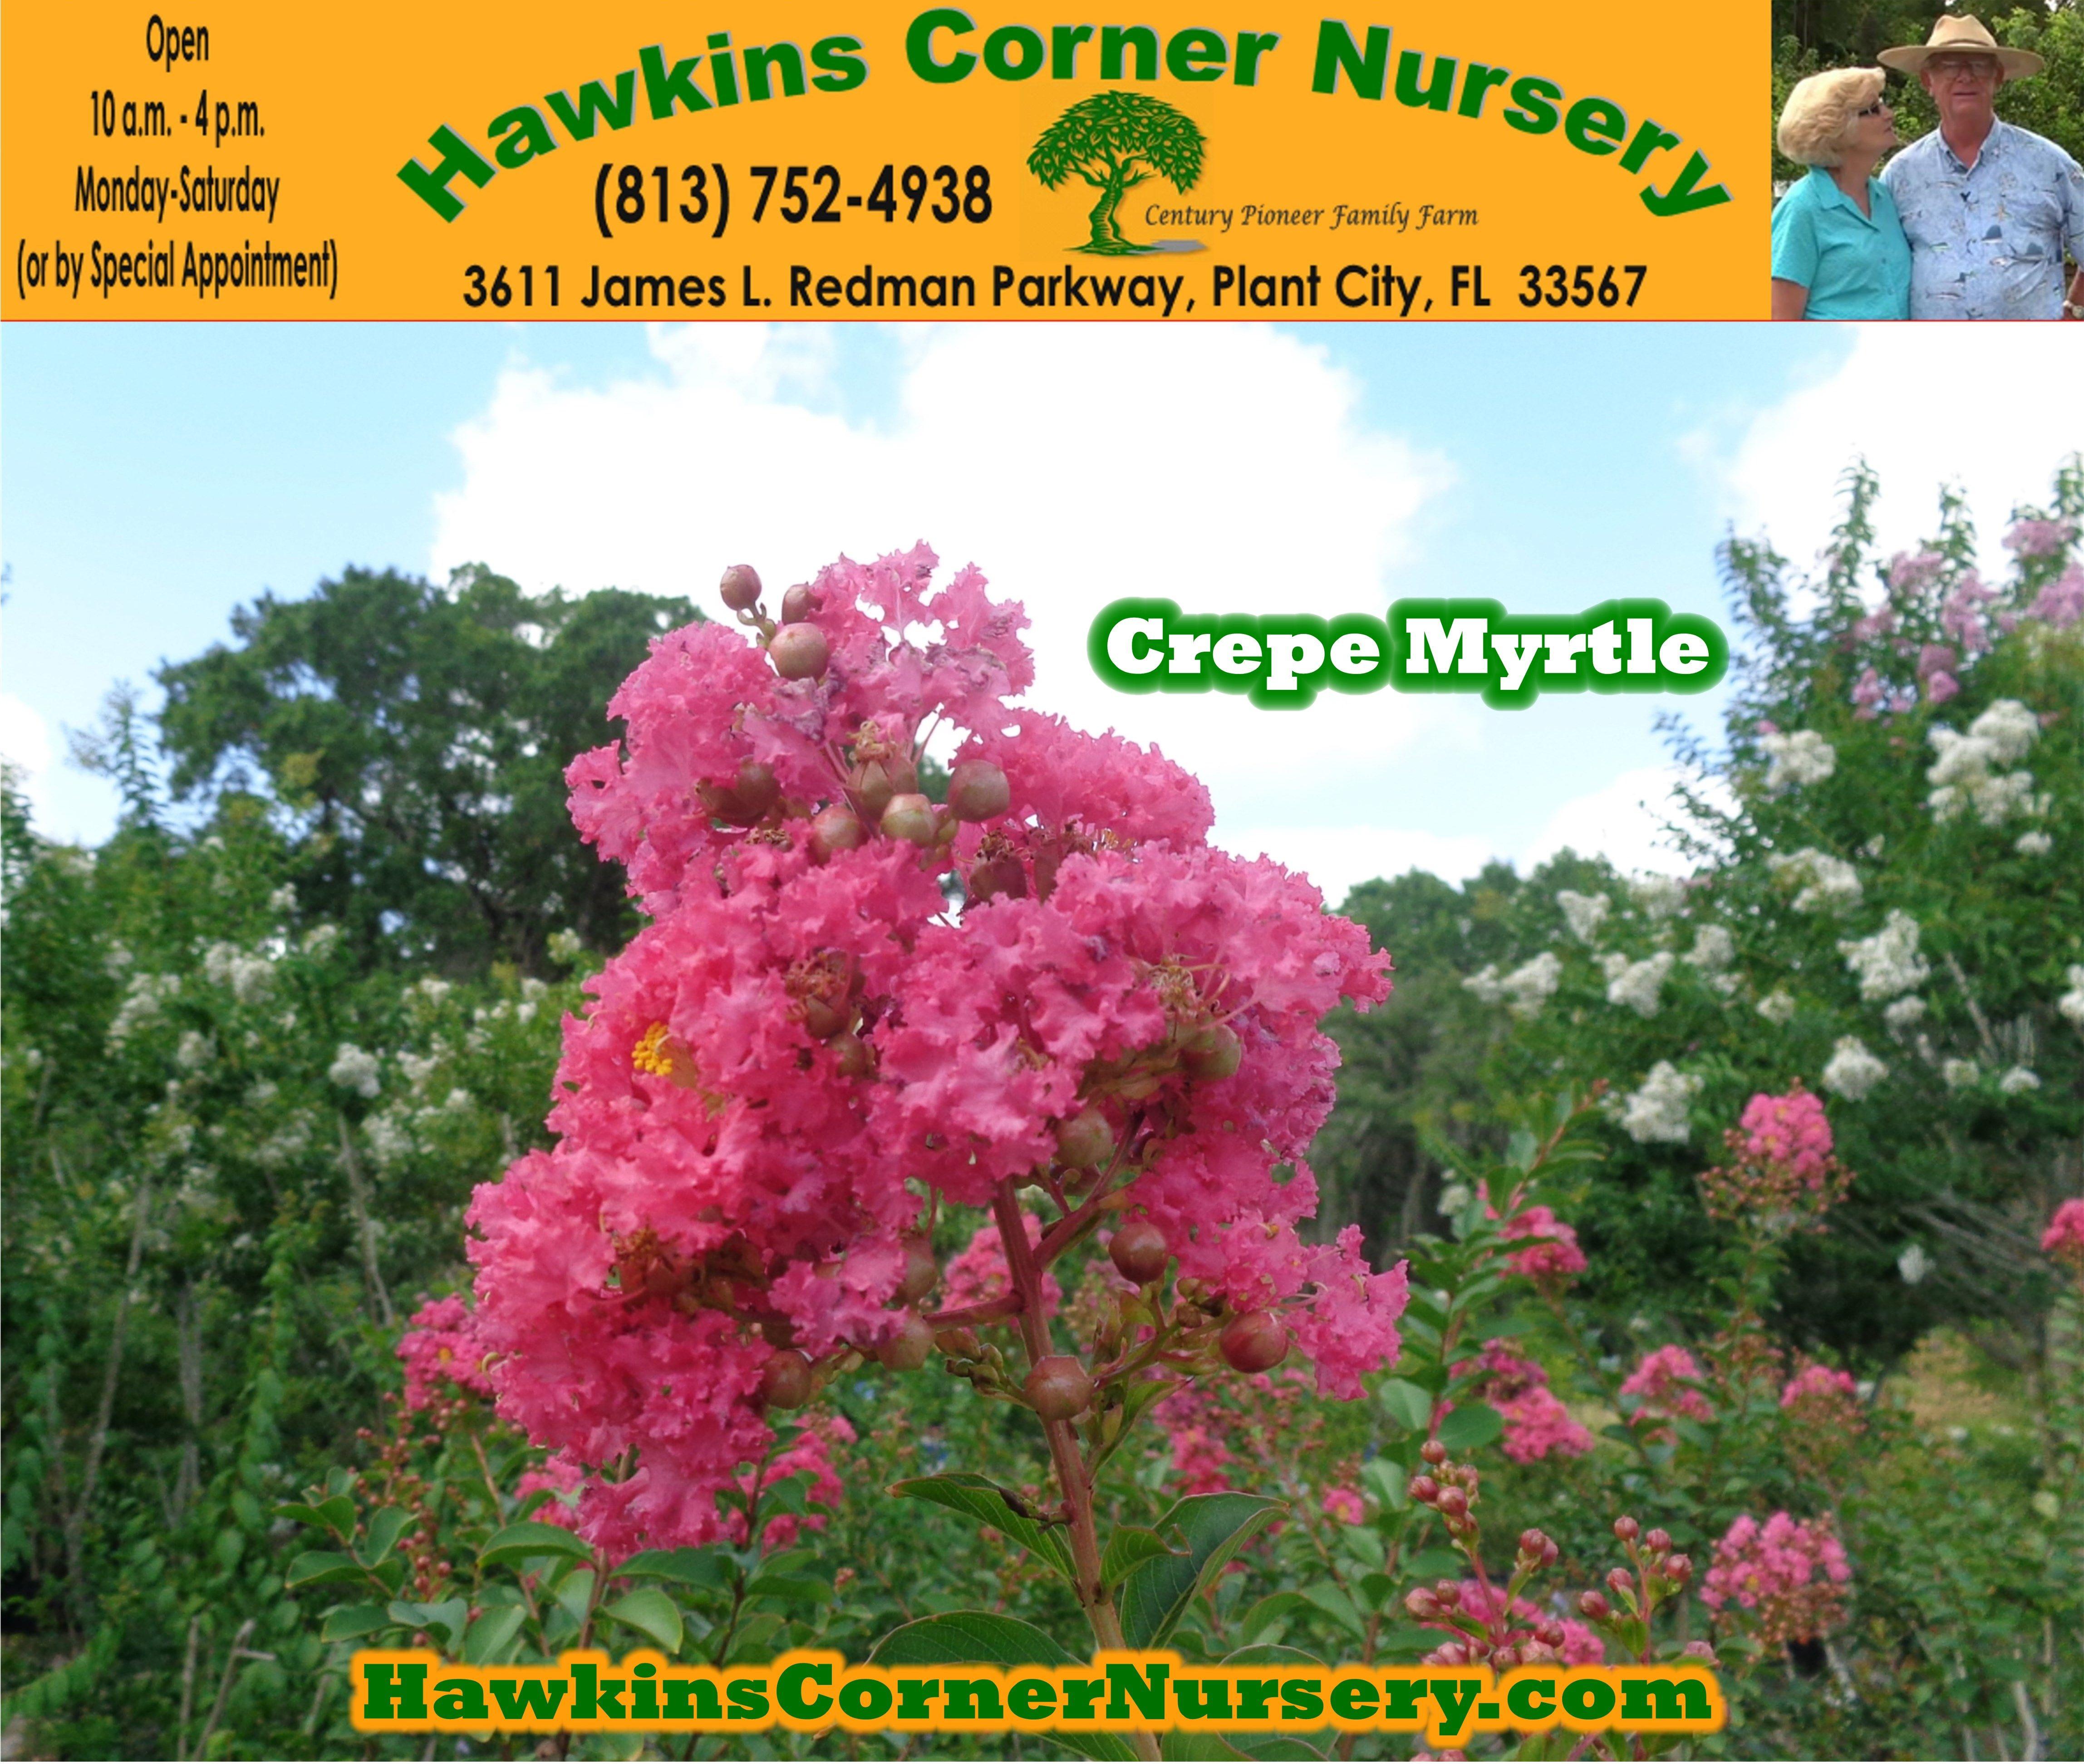 Crepe Myrtle By Hawkins Corner Nursery Plant City Fl 33565 Http